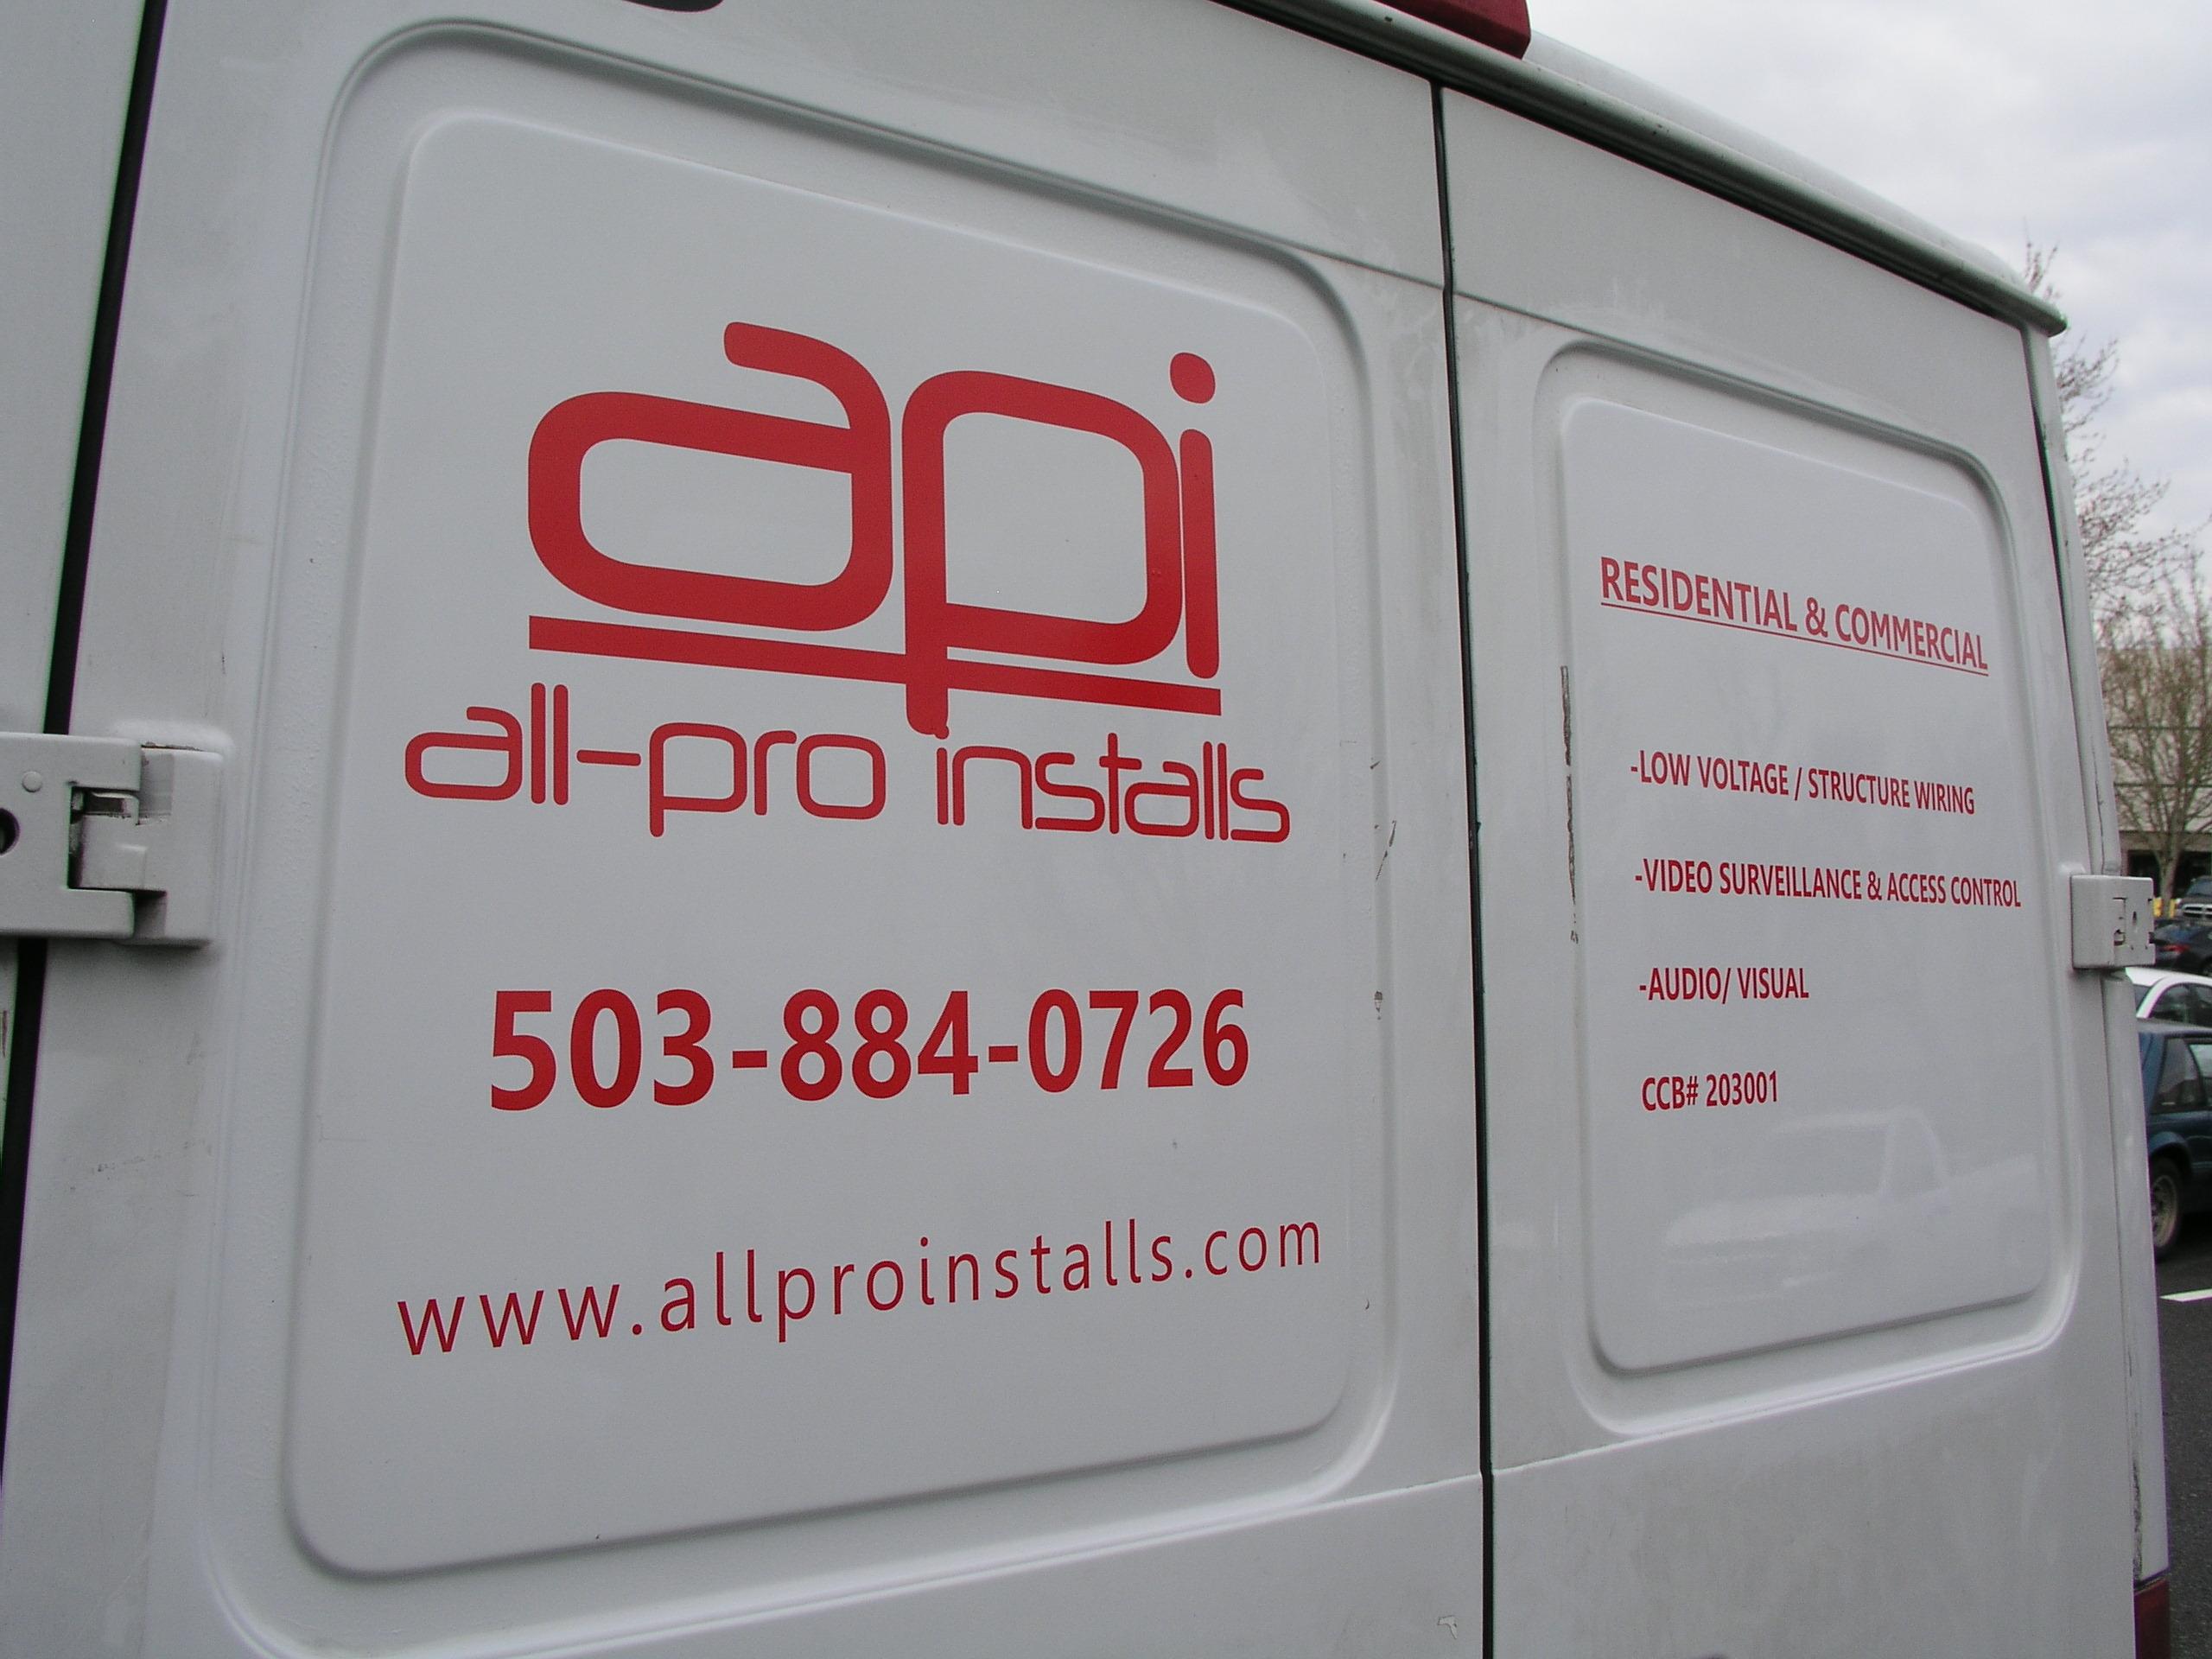 API - Branded Vehicle Graphics